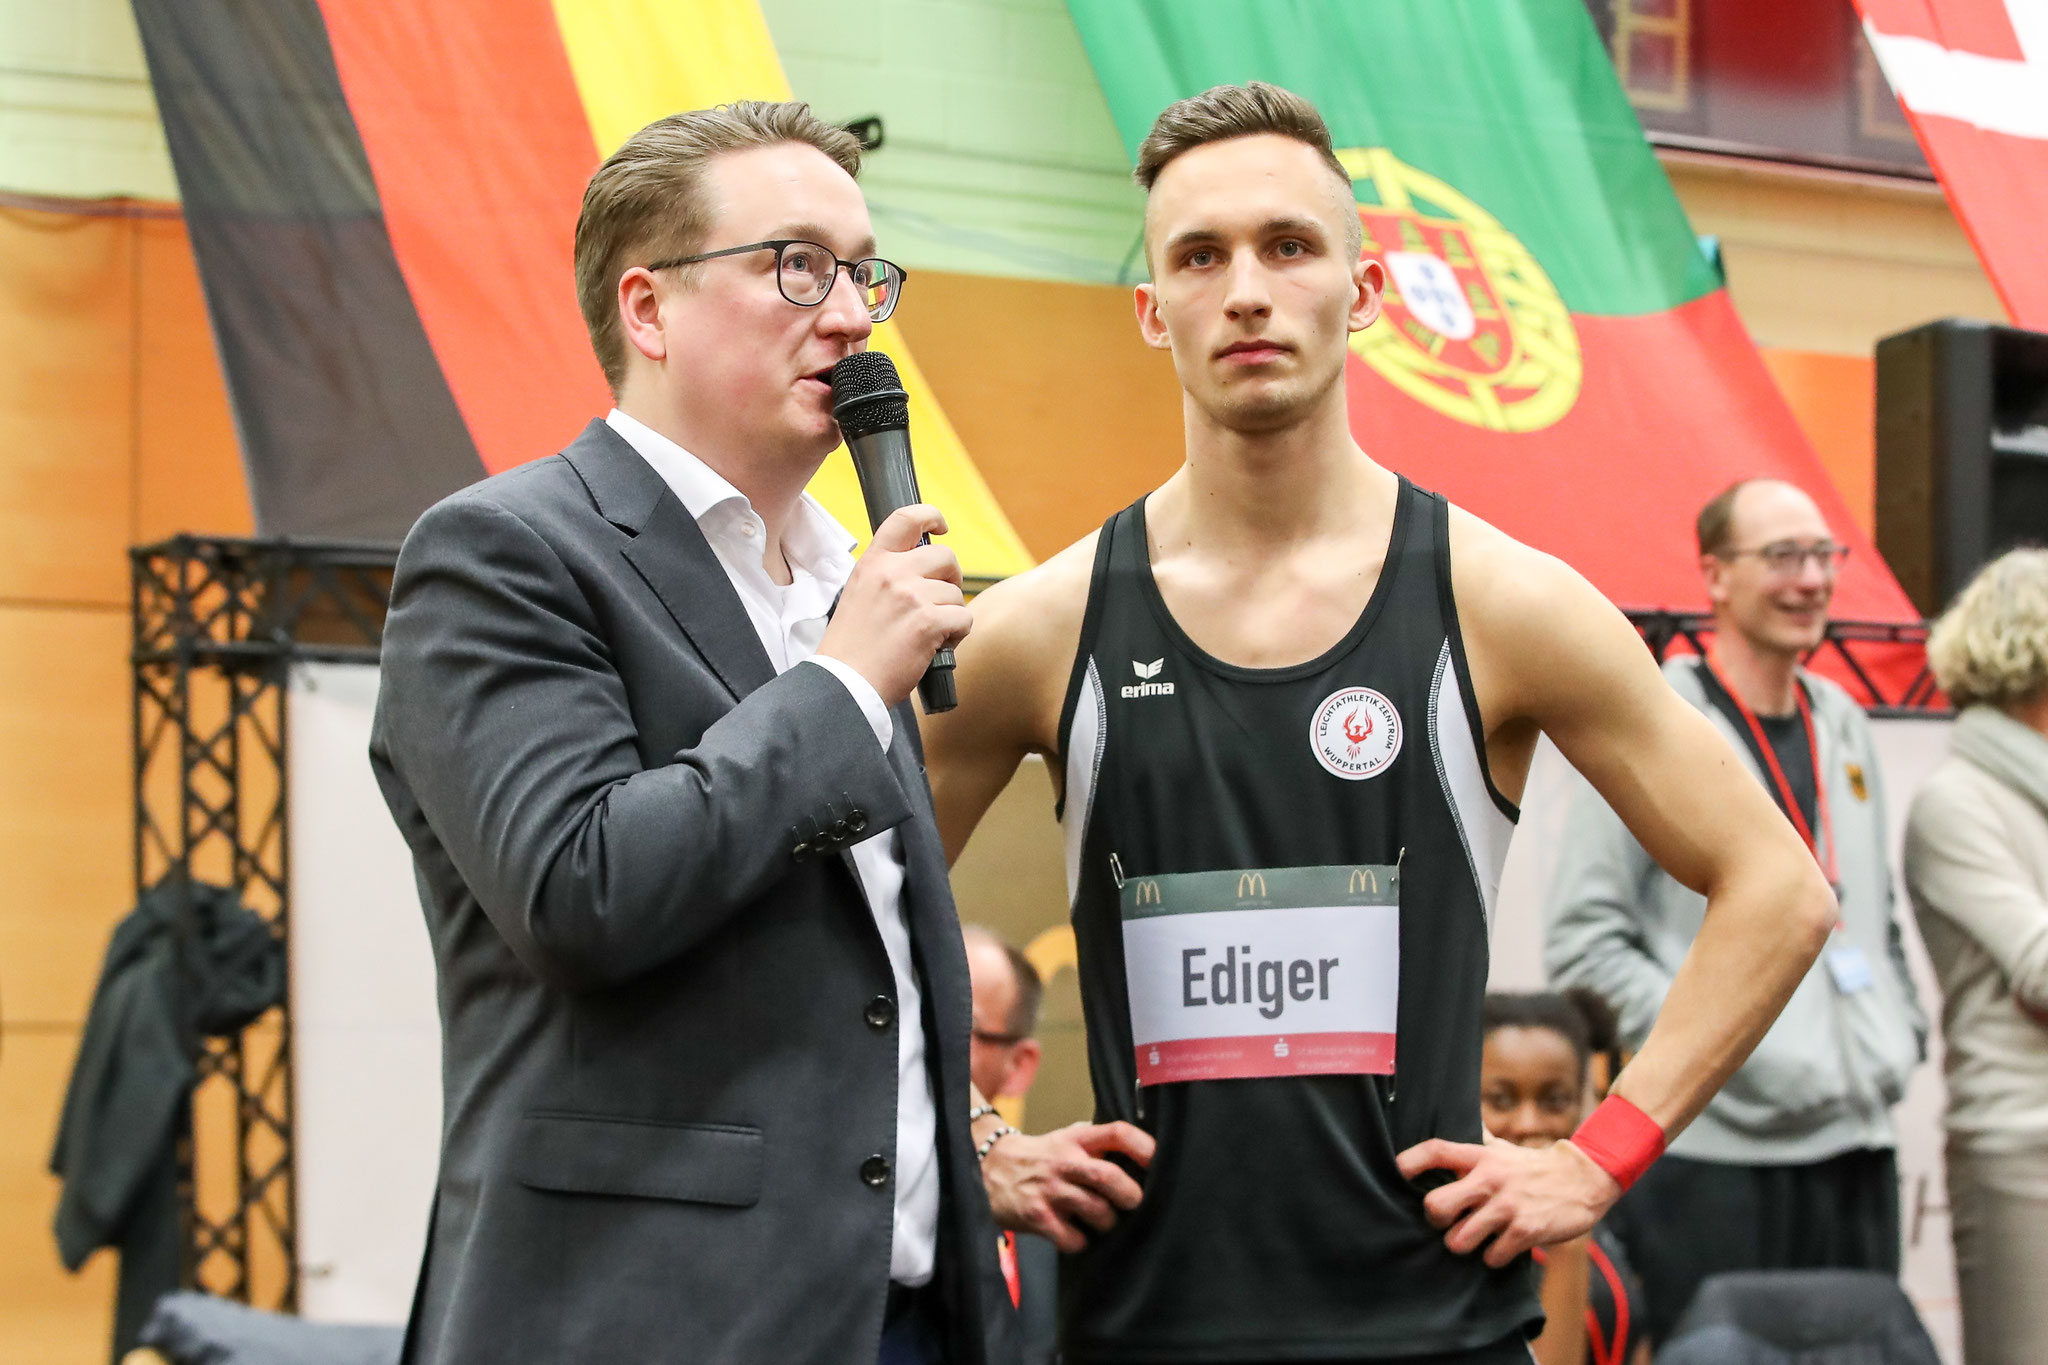 Interview Tom Ediger (Foto: Footcorner/Dirk Fußwinkel)